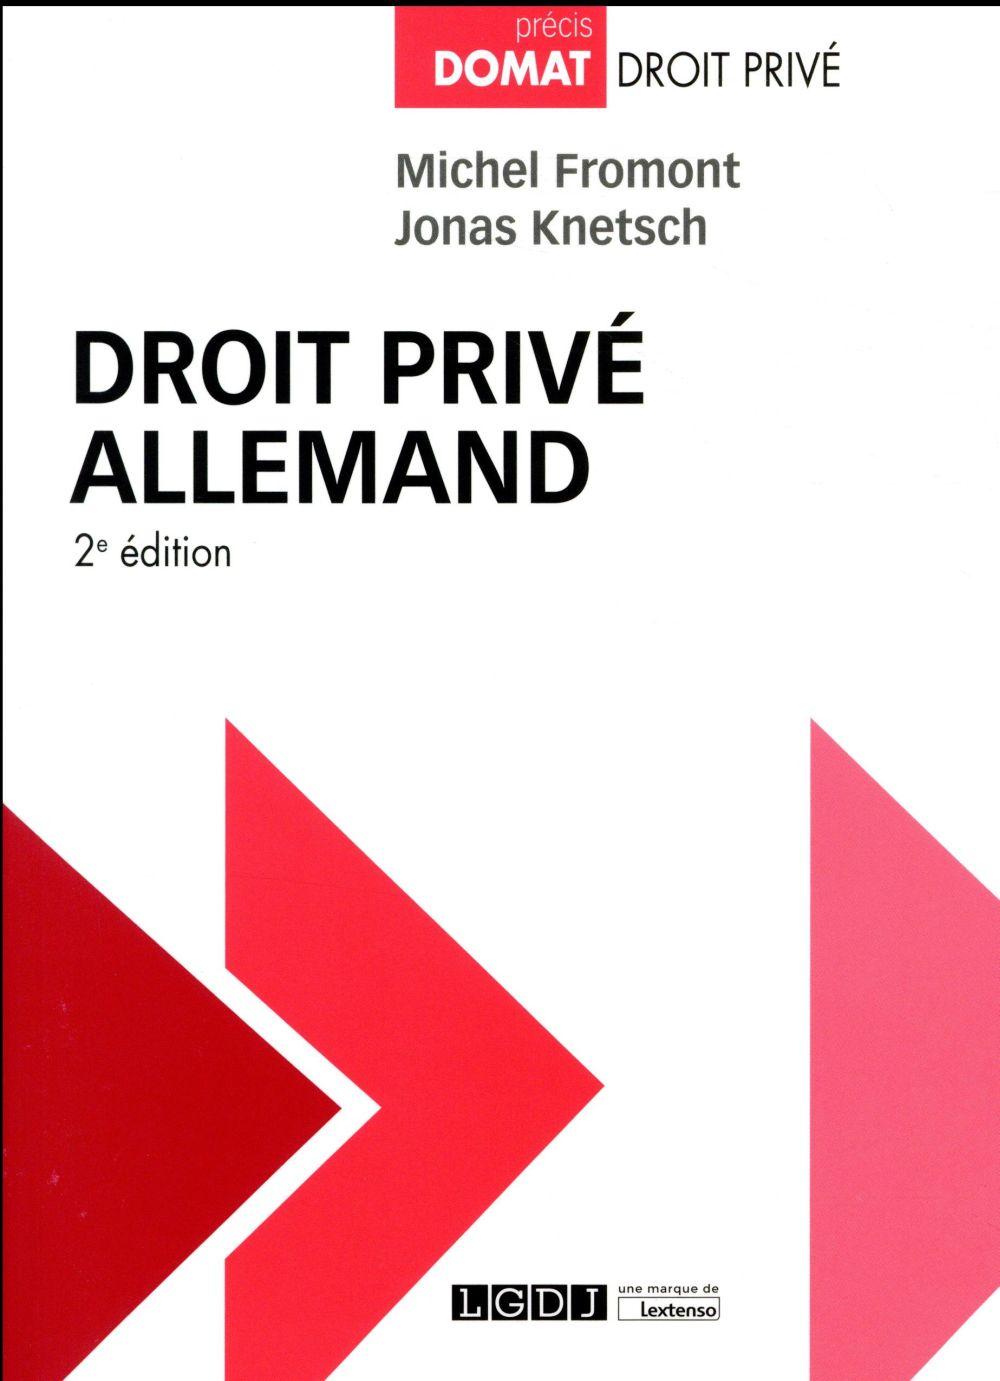 DROIT PRIVE ALLEMAND (2E EDITION)